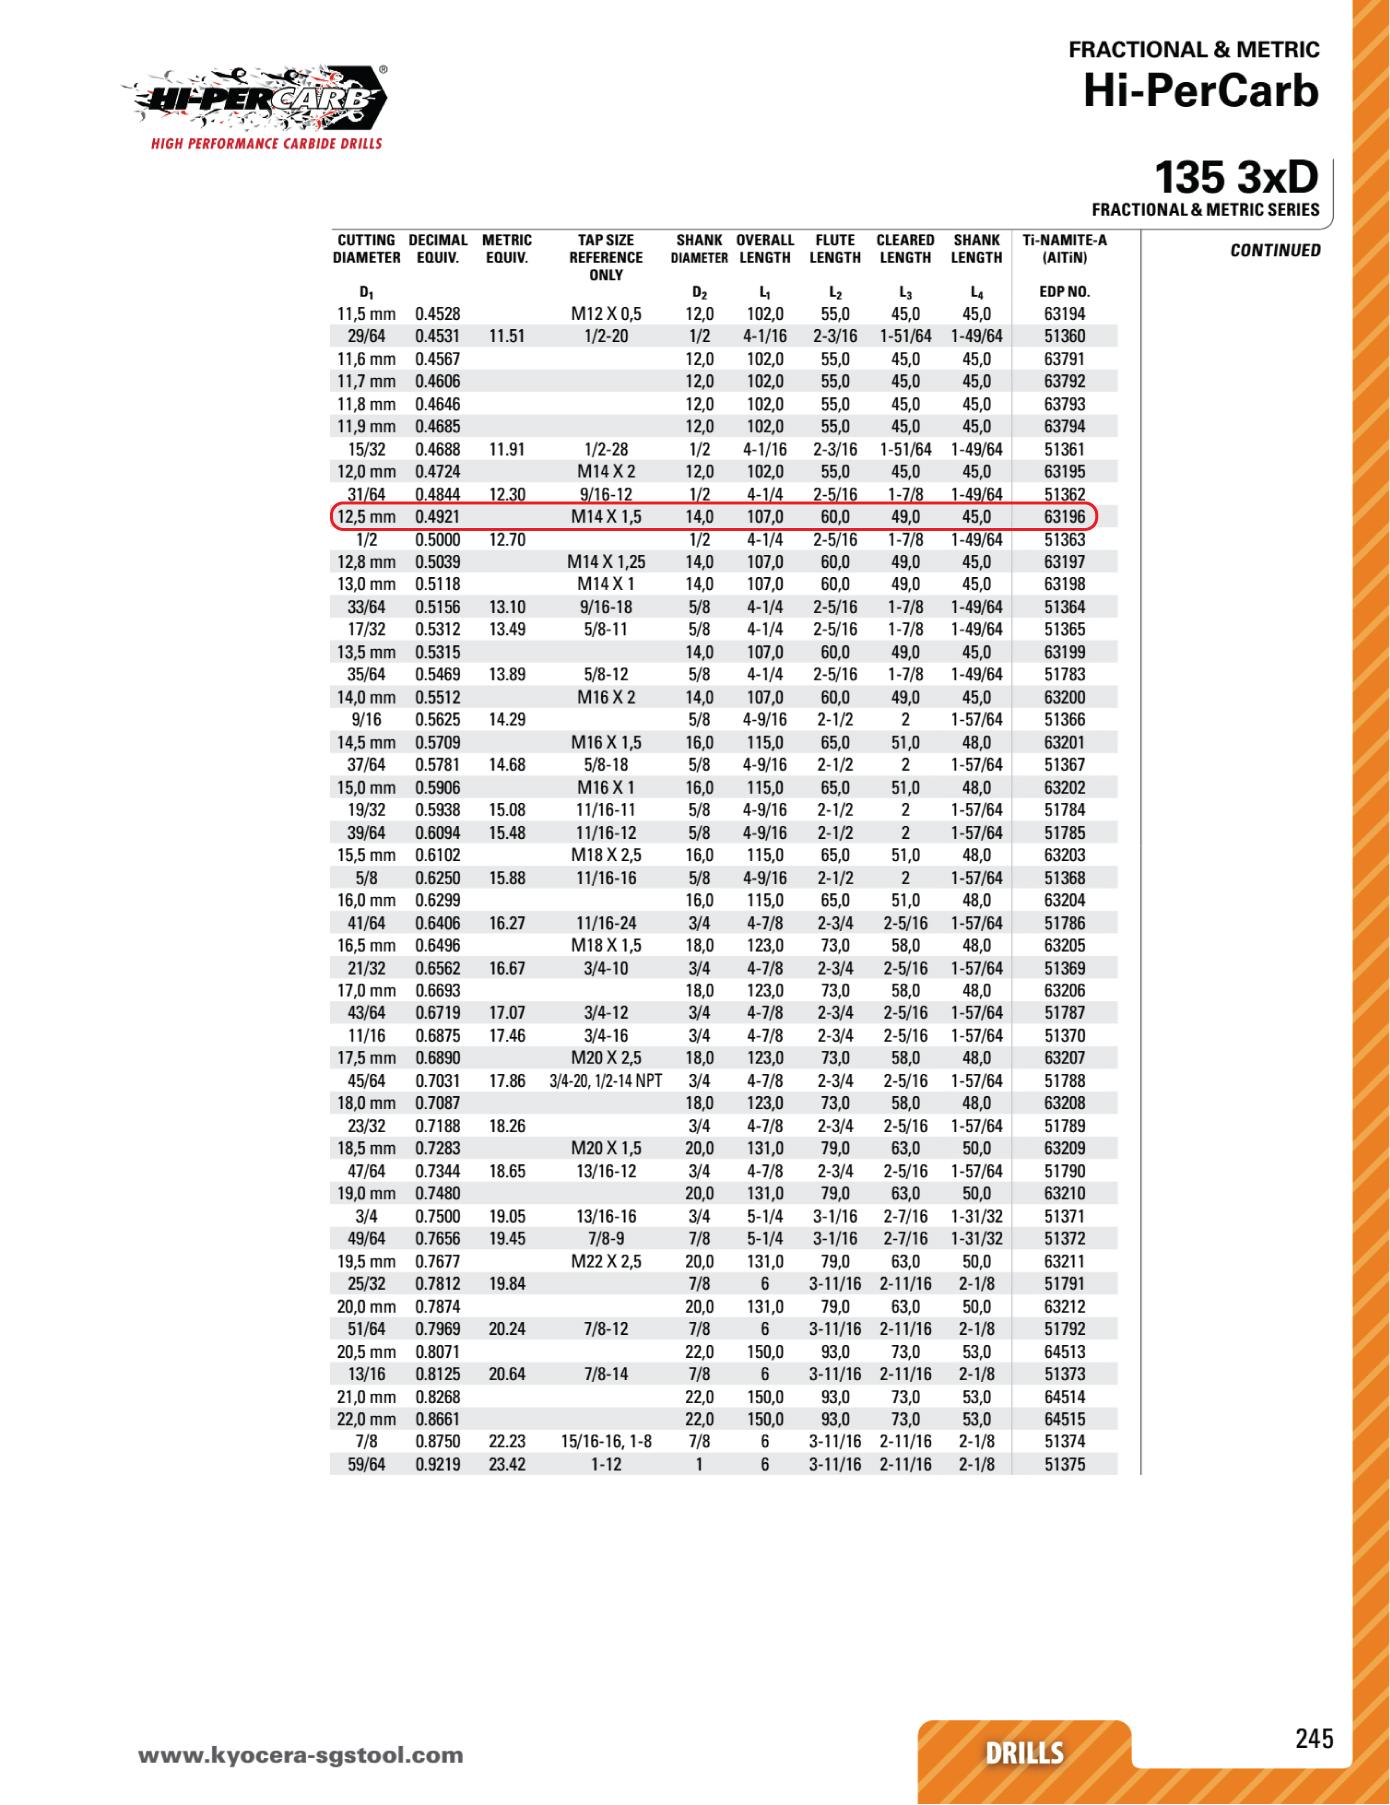 MŨI KHOAN NGUYÊN KHỐI PHI 12.5 KYOCERA SGS HI-PERCARB KSP63196